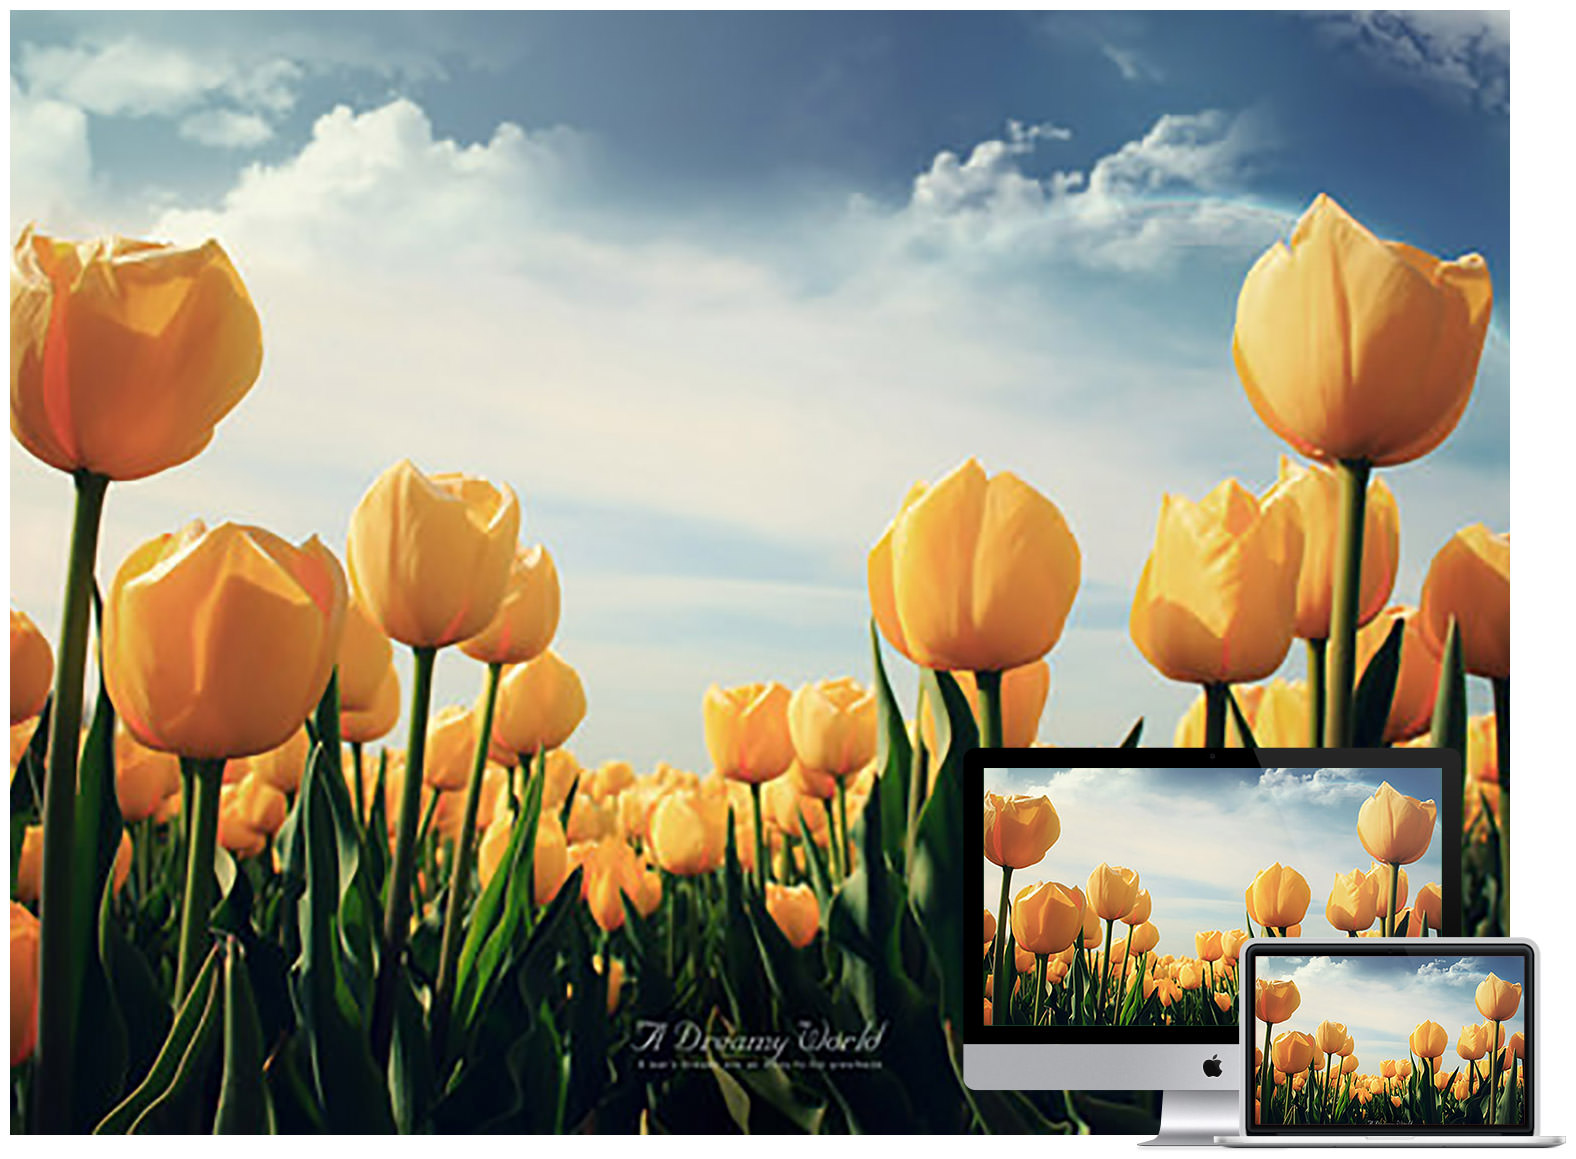 60 Beautiful Flowers Wallpapers To Download Hongkiat